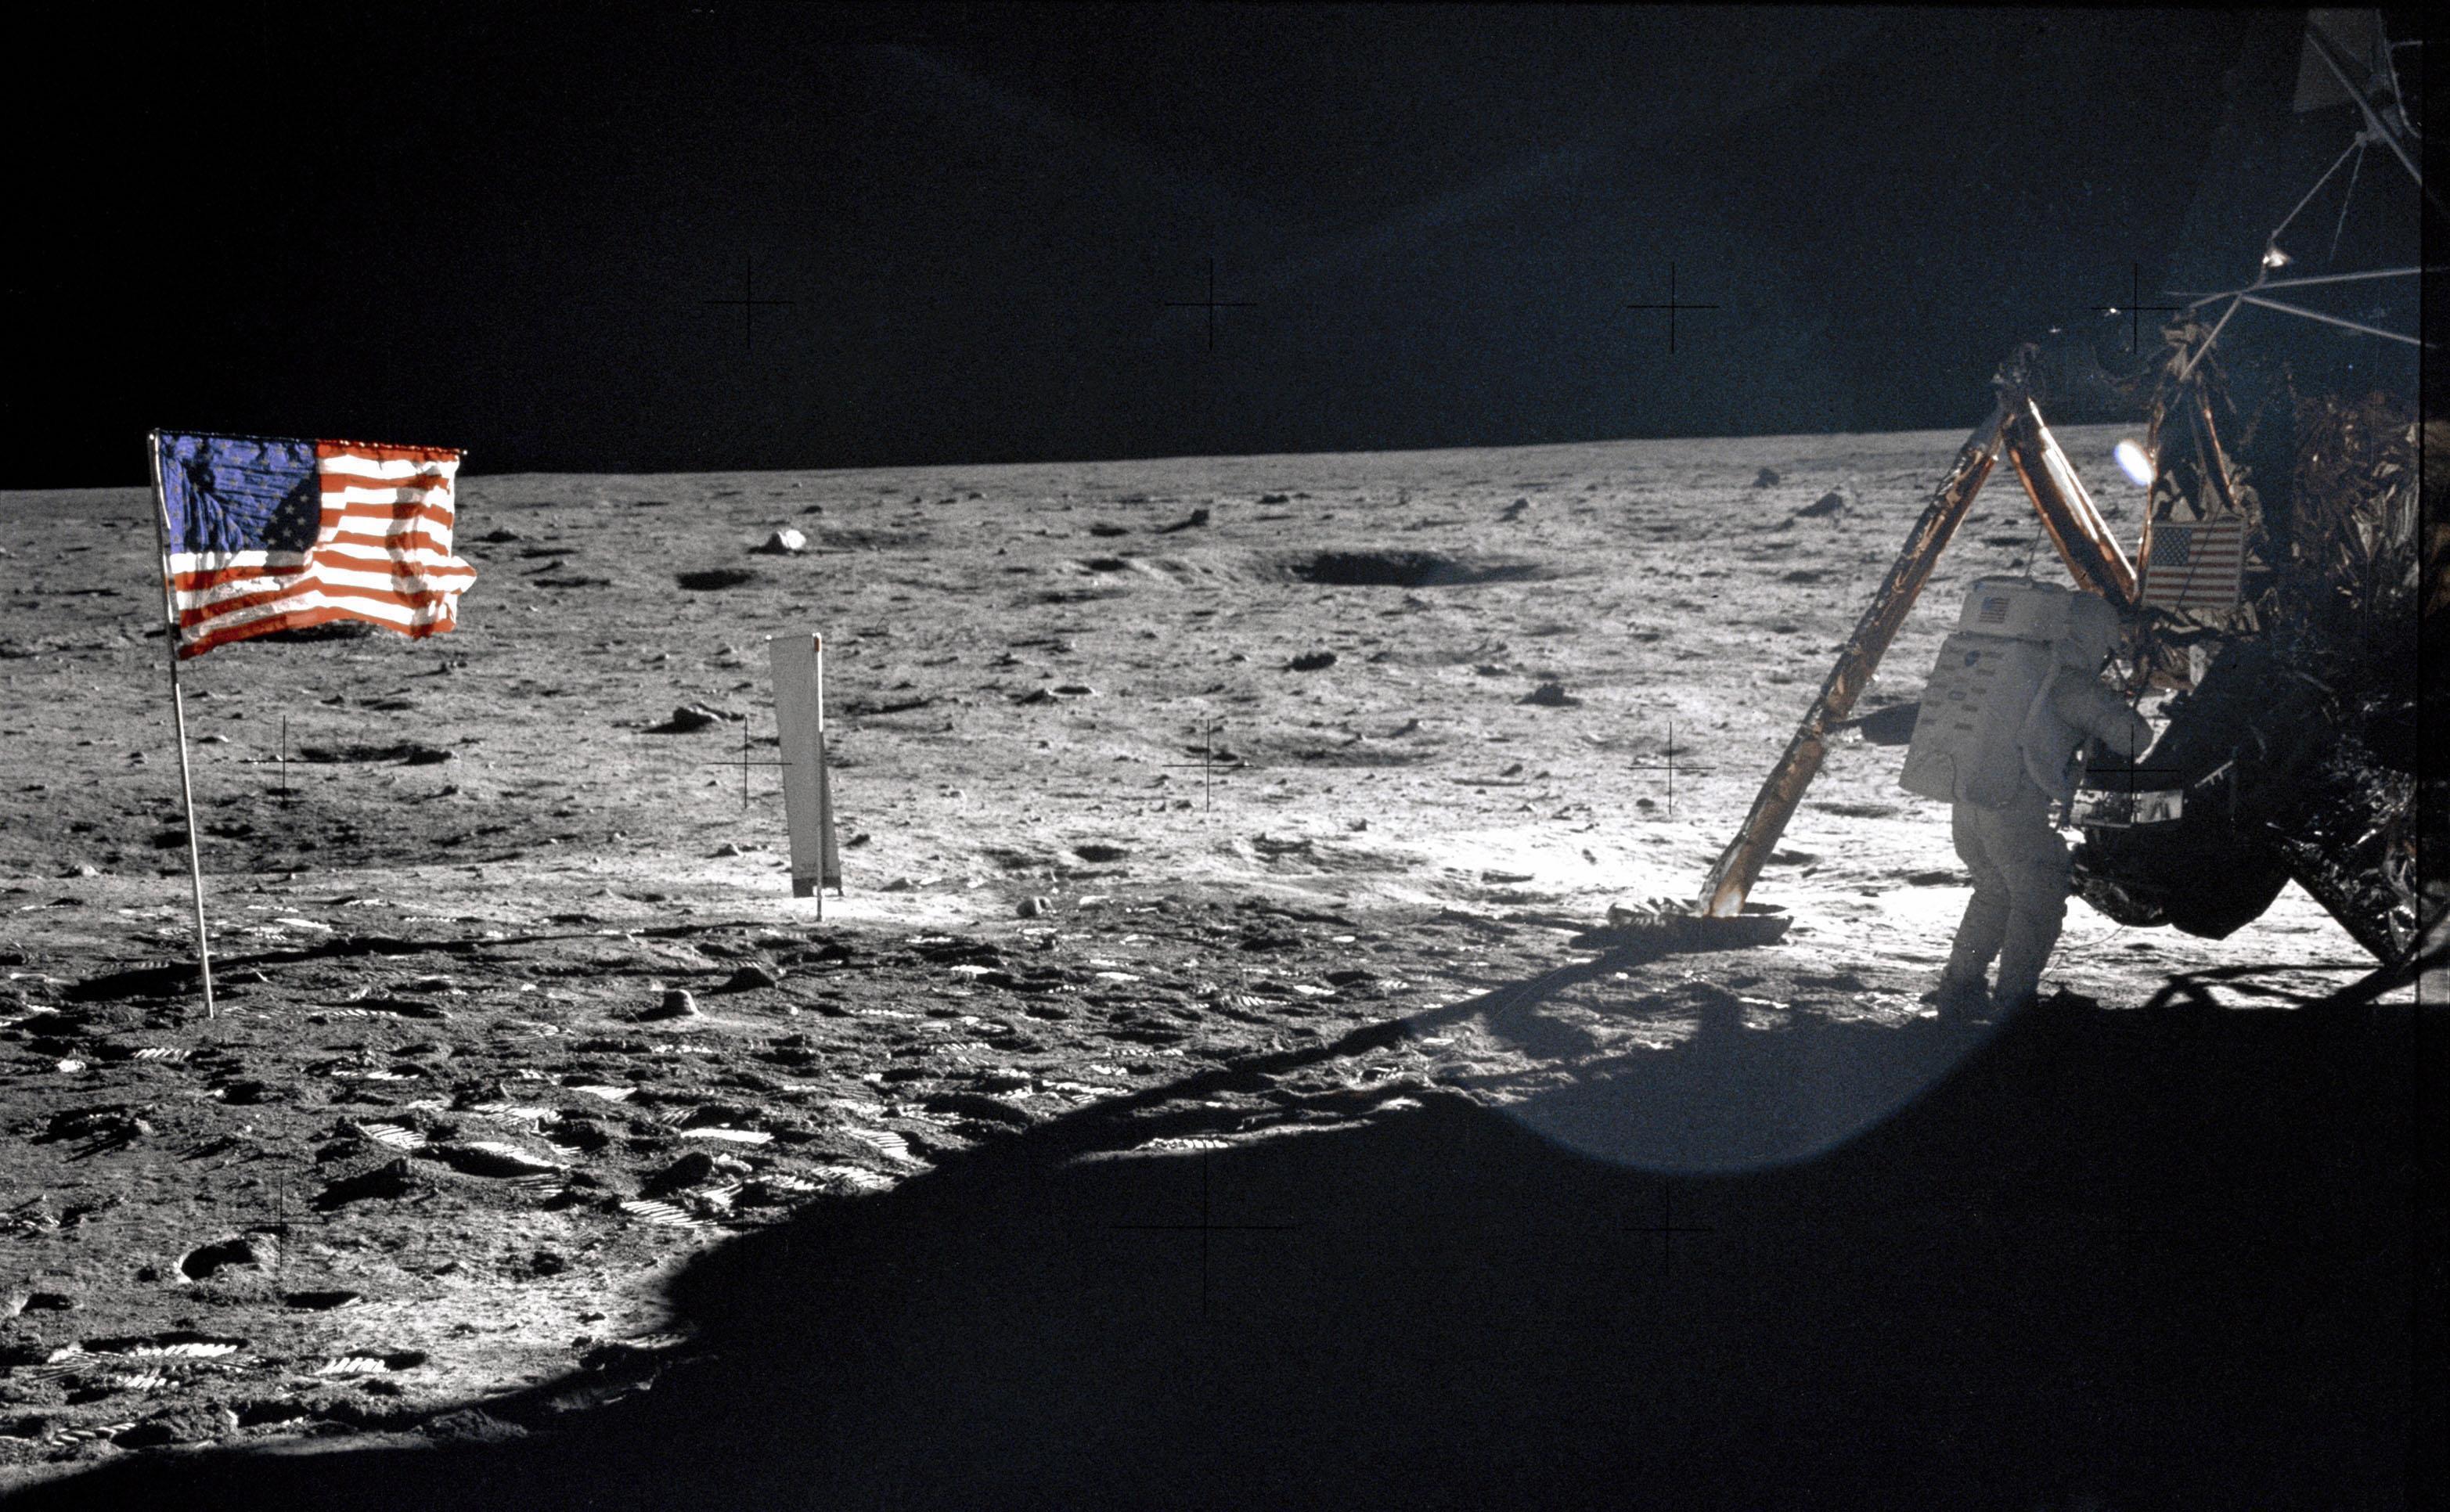 First landing on the moon, school girls lesbian porn pics